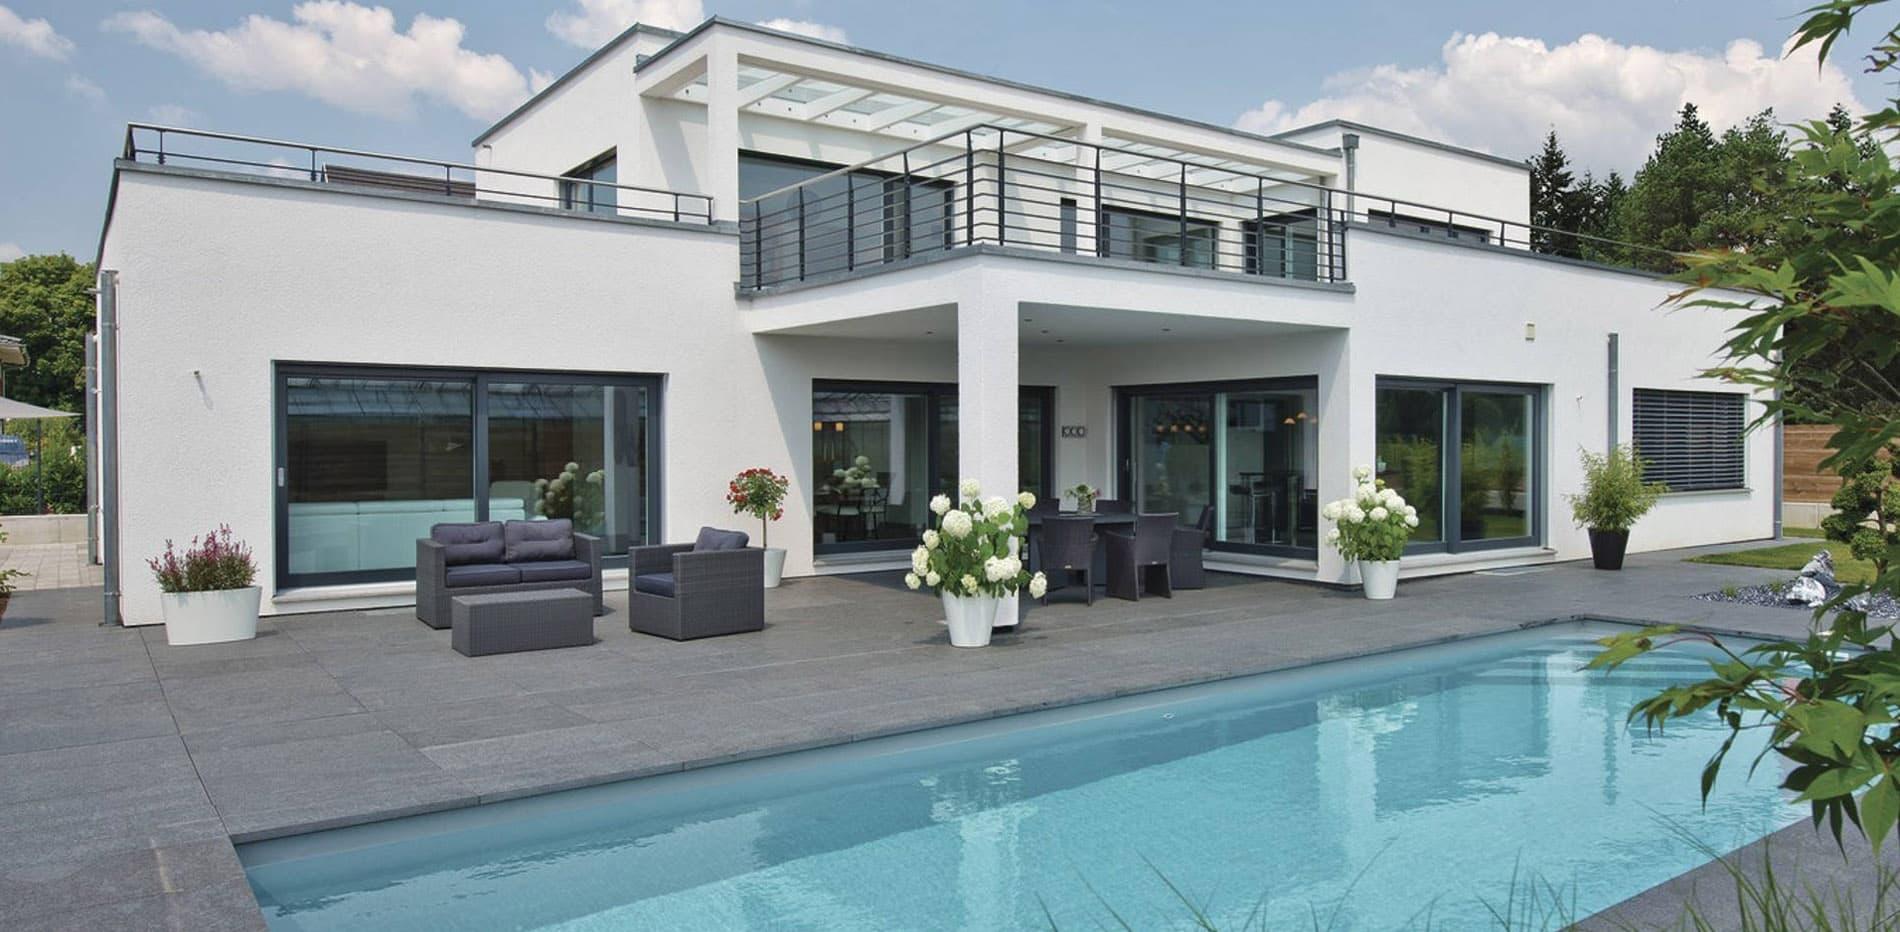 weberhaus die zukunft leben. Black Bedroom Furniture Sets. Home Design Ideas